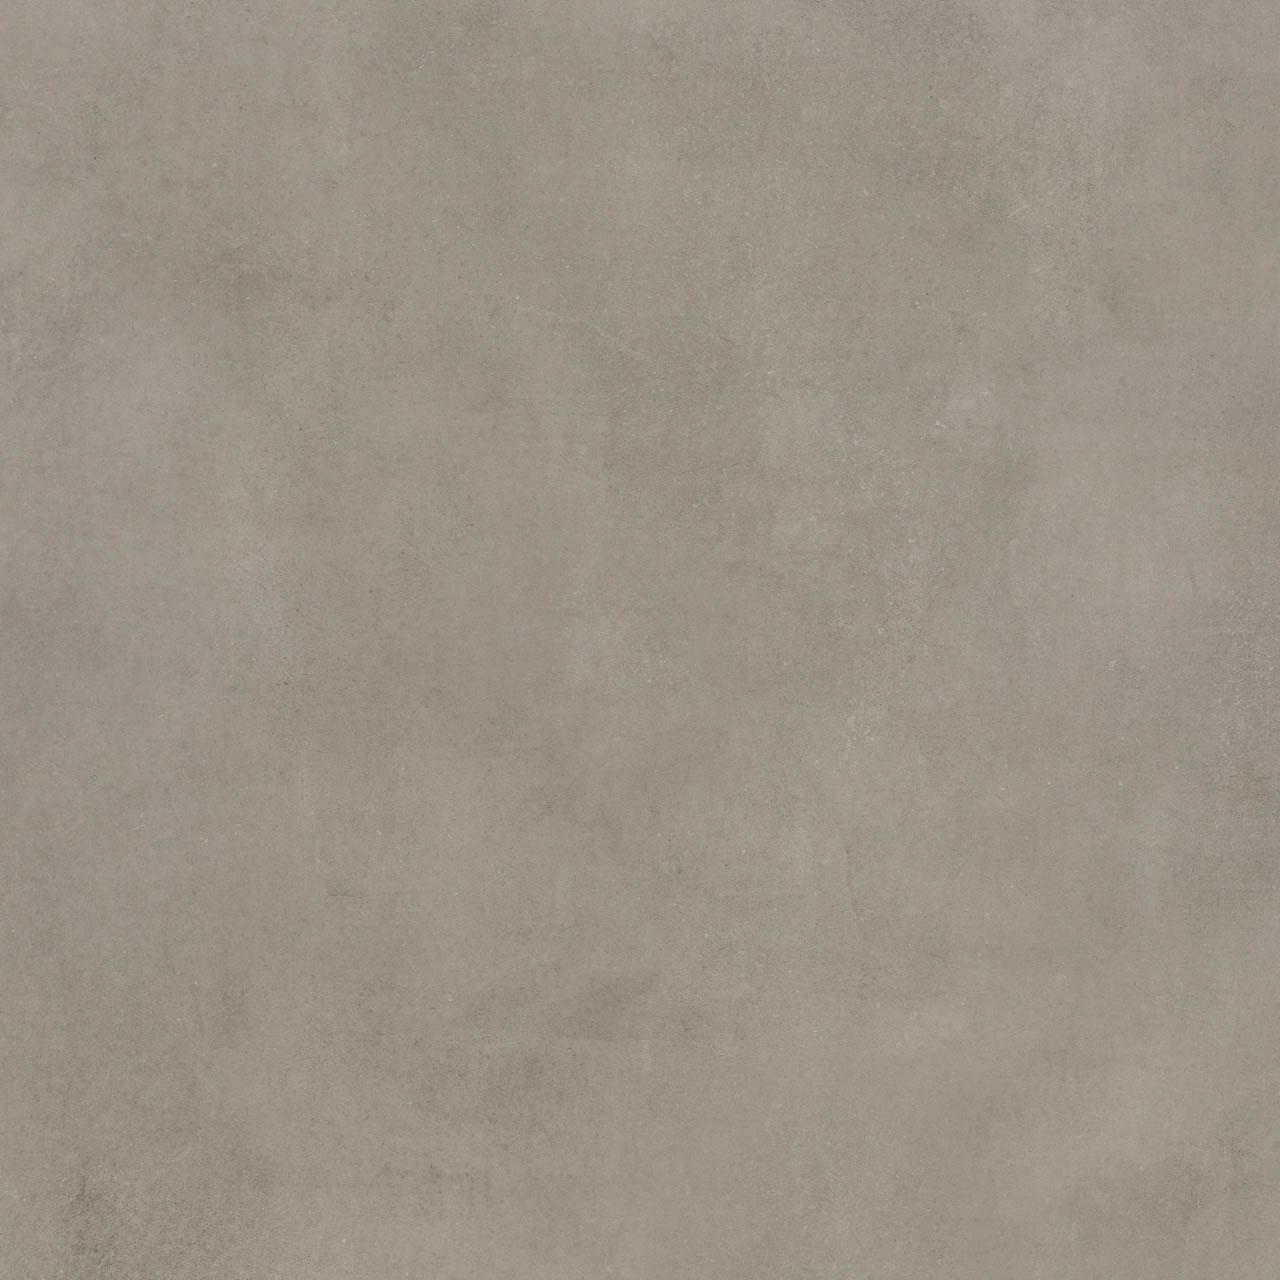 munari concreto ac 60×60